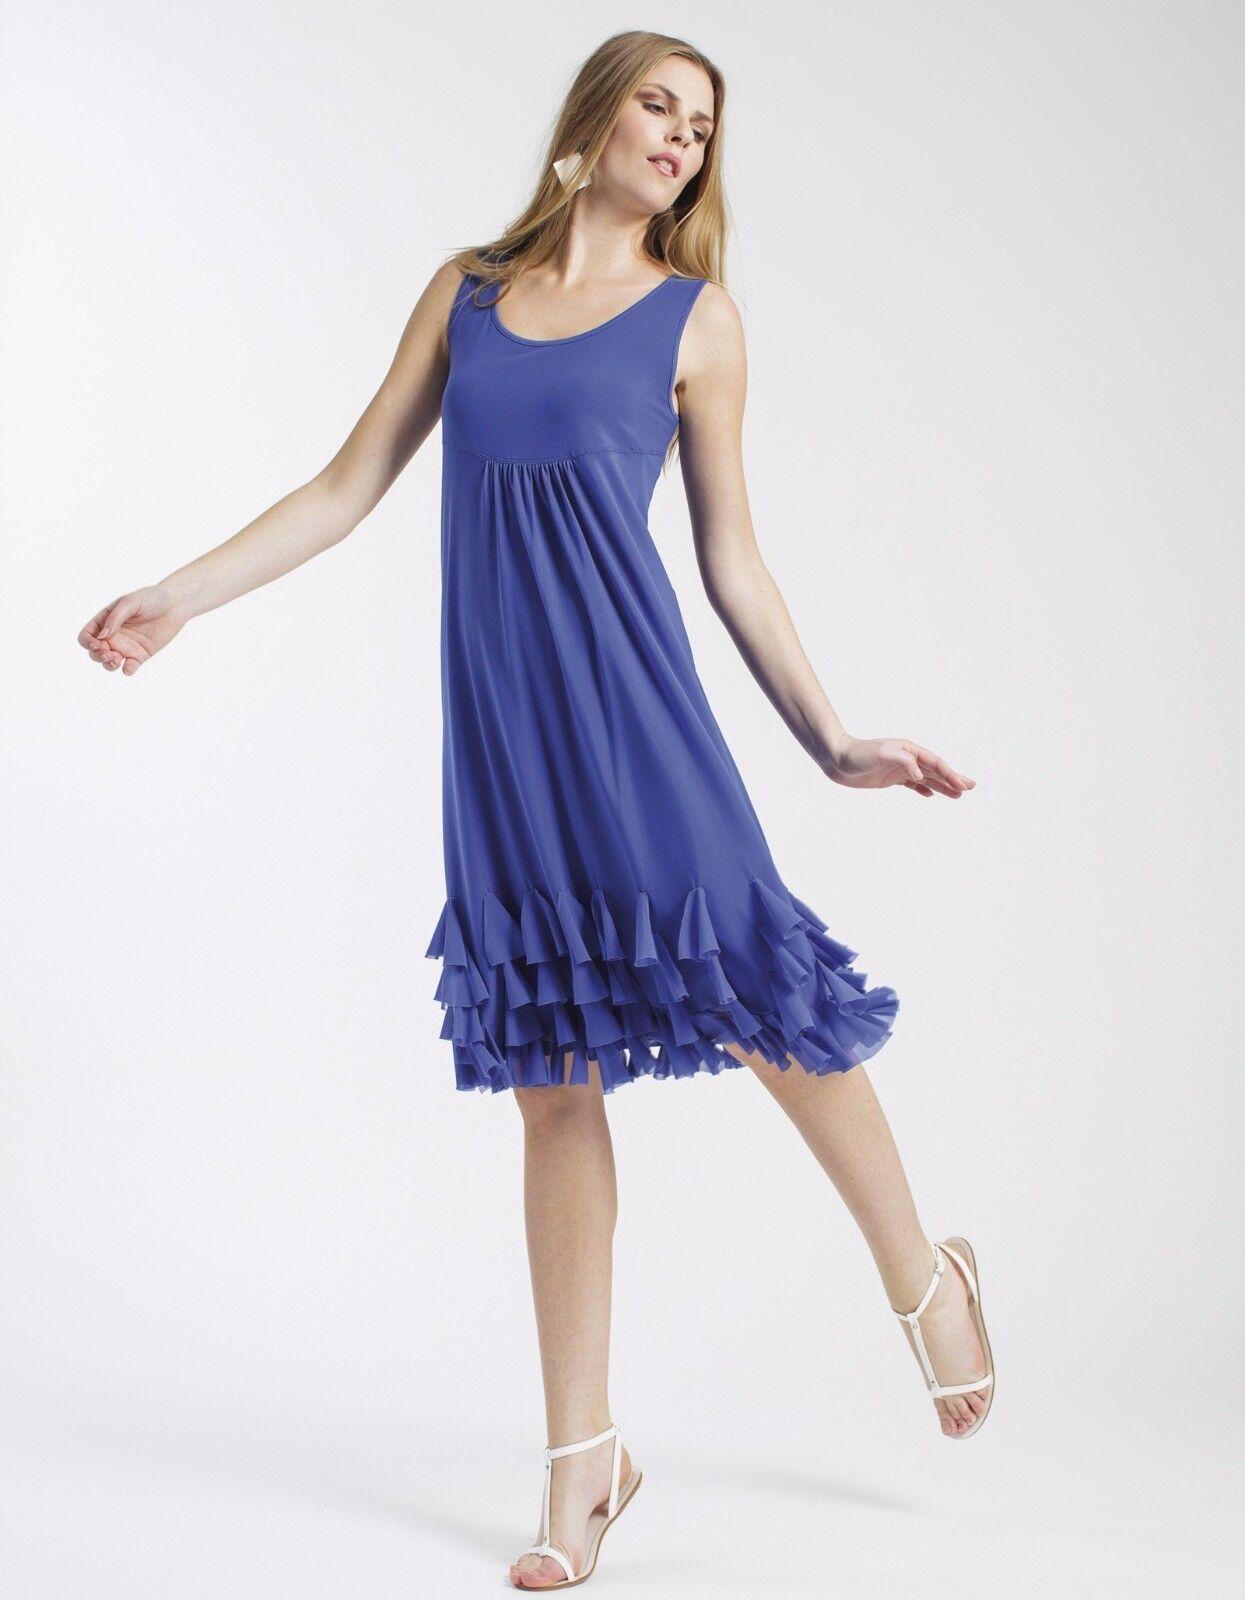 Beautiful Stylish Authentic DECA PARIS Blau Größe 5 MALOU orig.